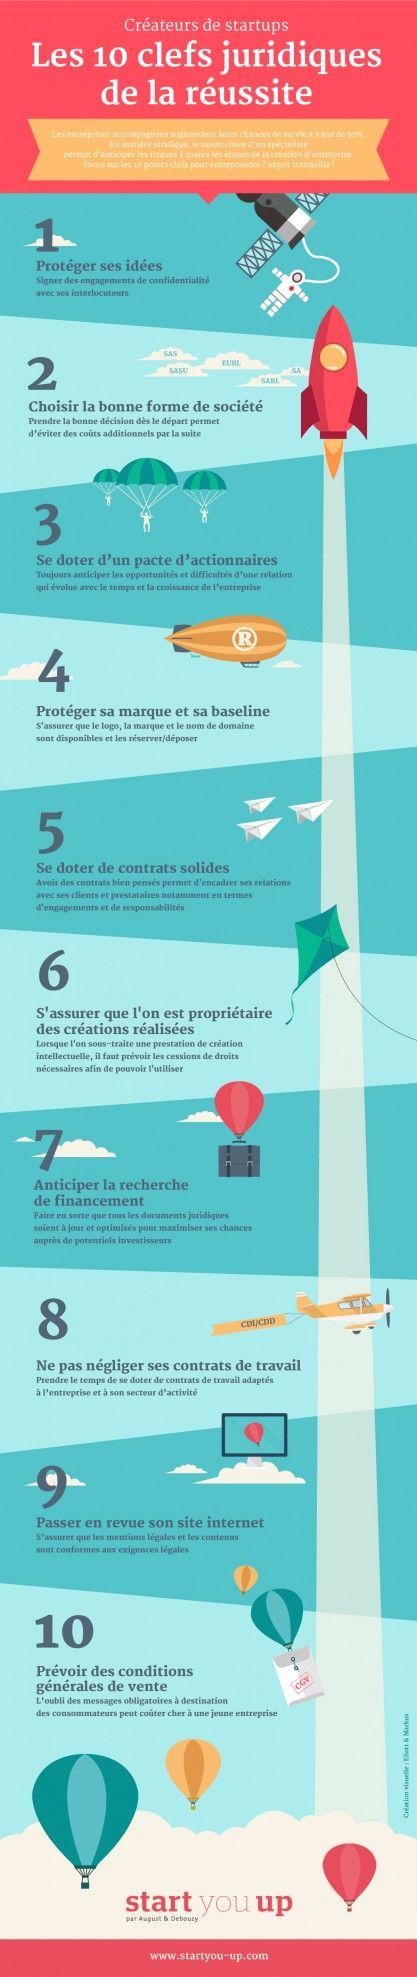 start_you_up_infographie_10_clefs_juridiques_reussite